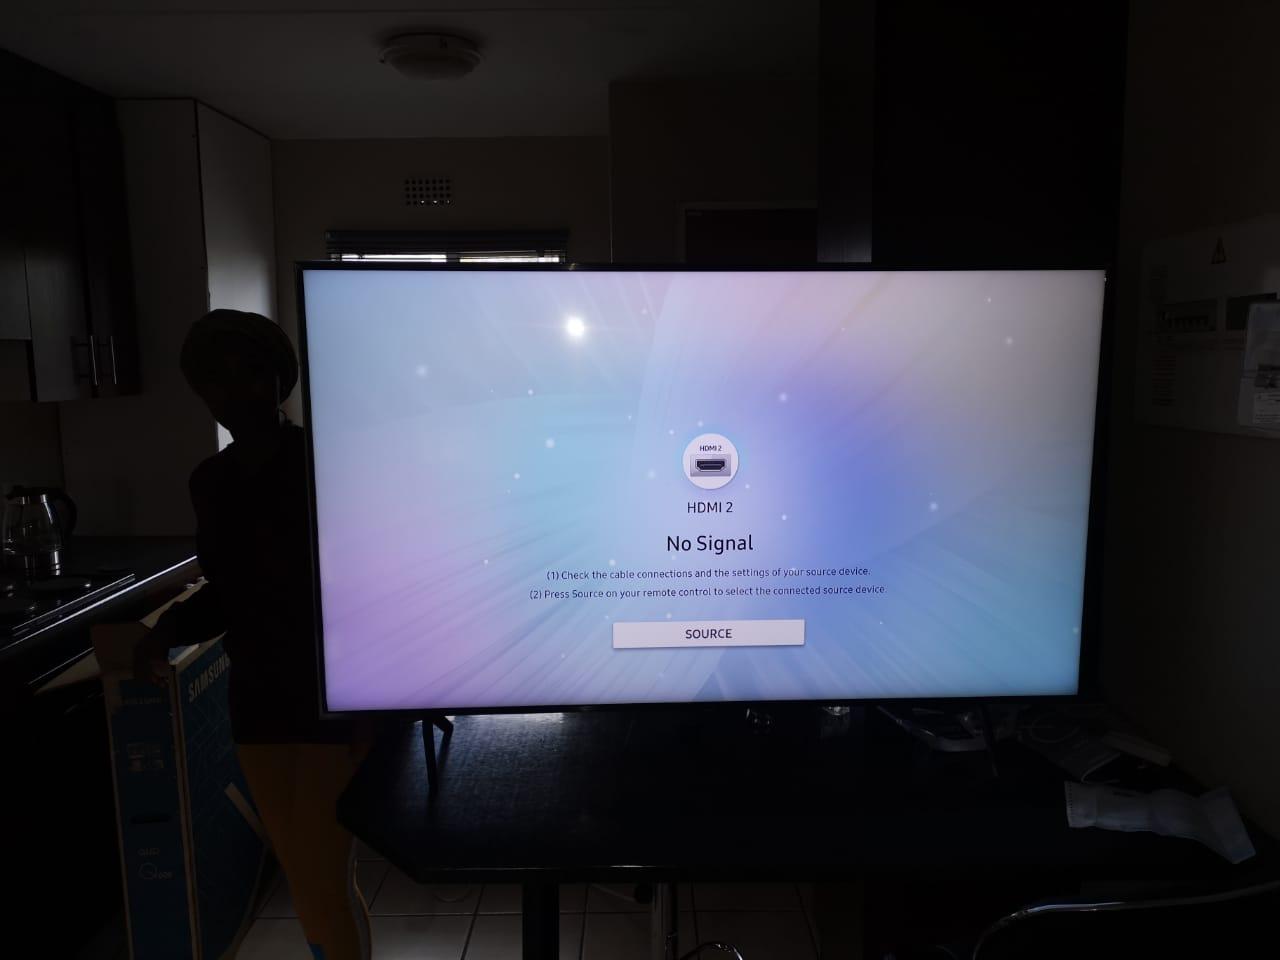 SAMSUNG QLED SMART TV FOR SALE IN WARRANTY STILL